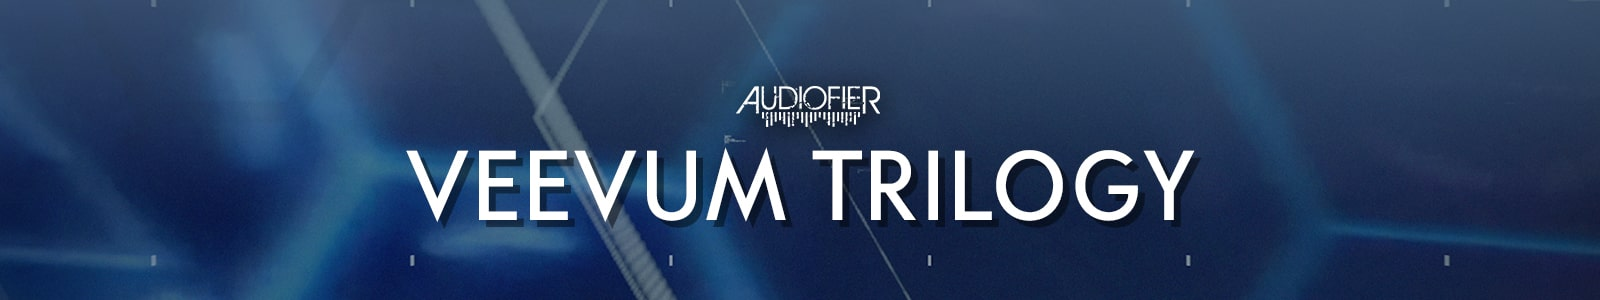 [DTMニュース]audiofier-veevum-trilogy-sale-1